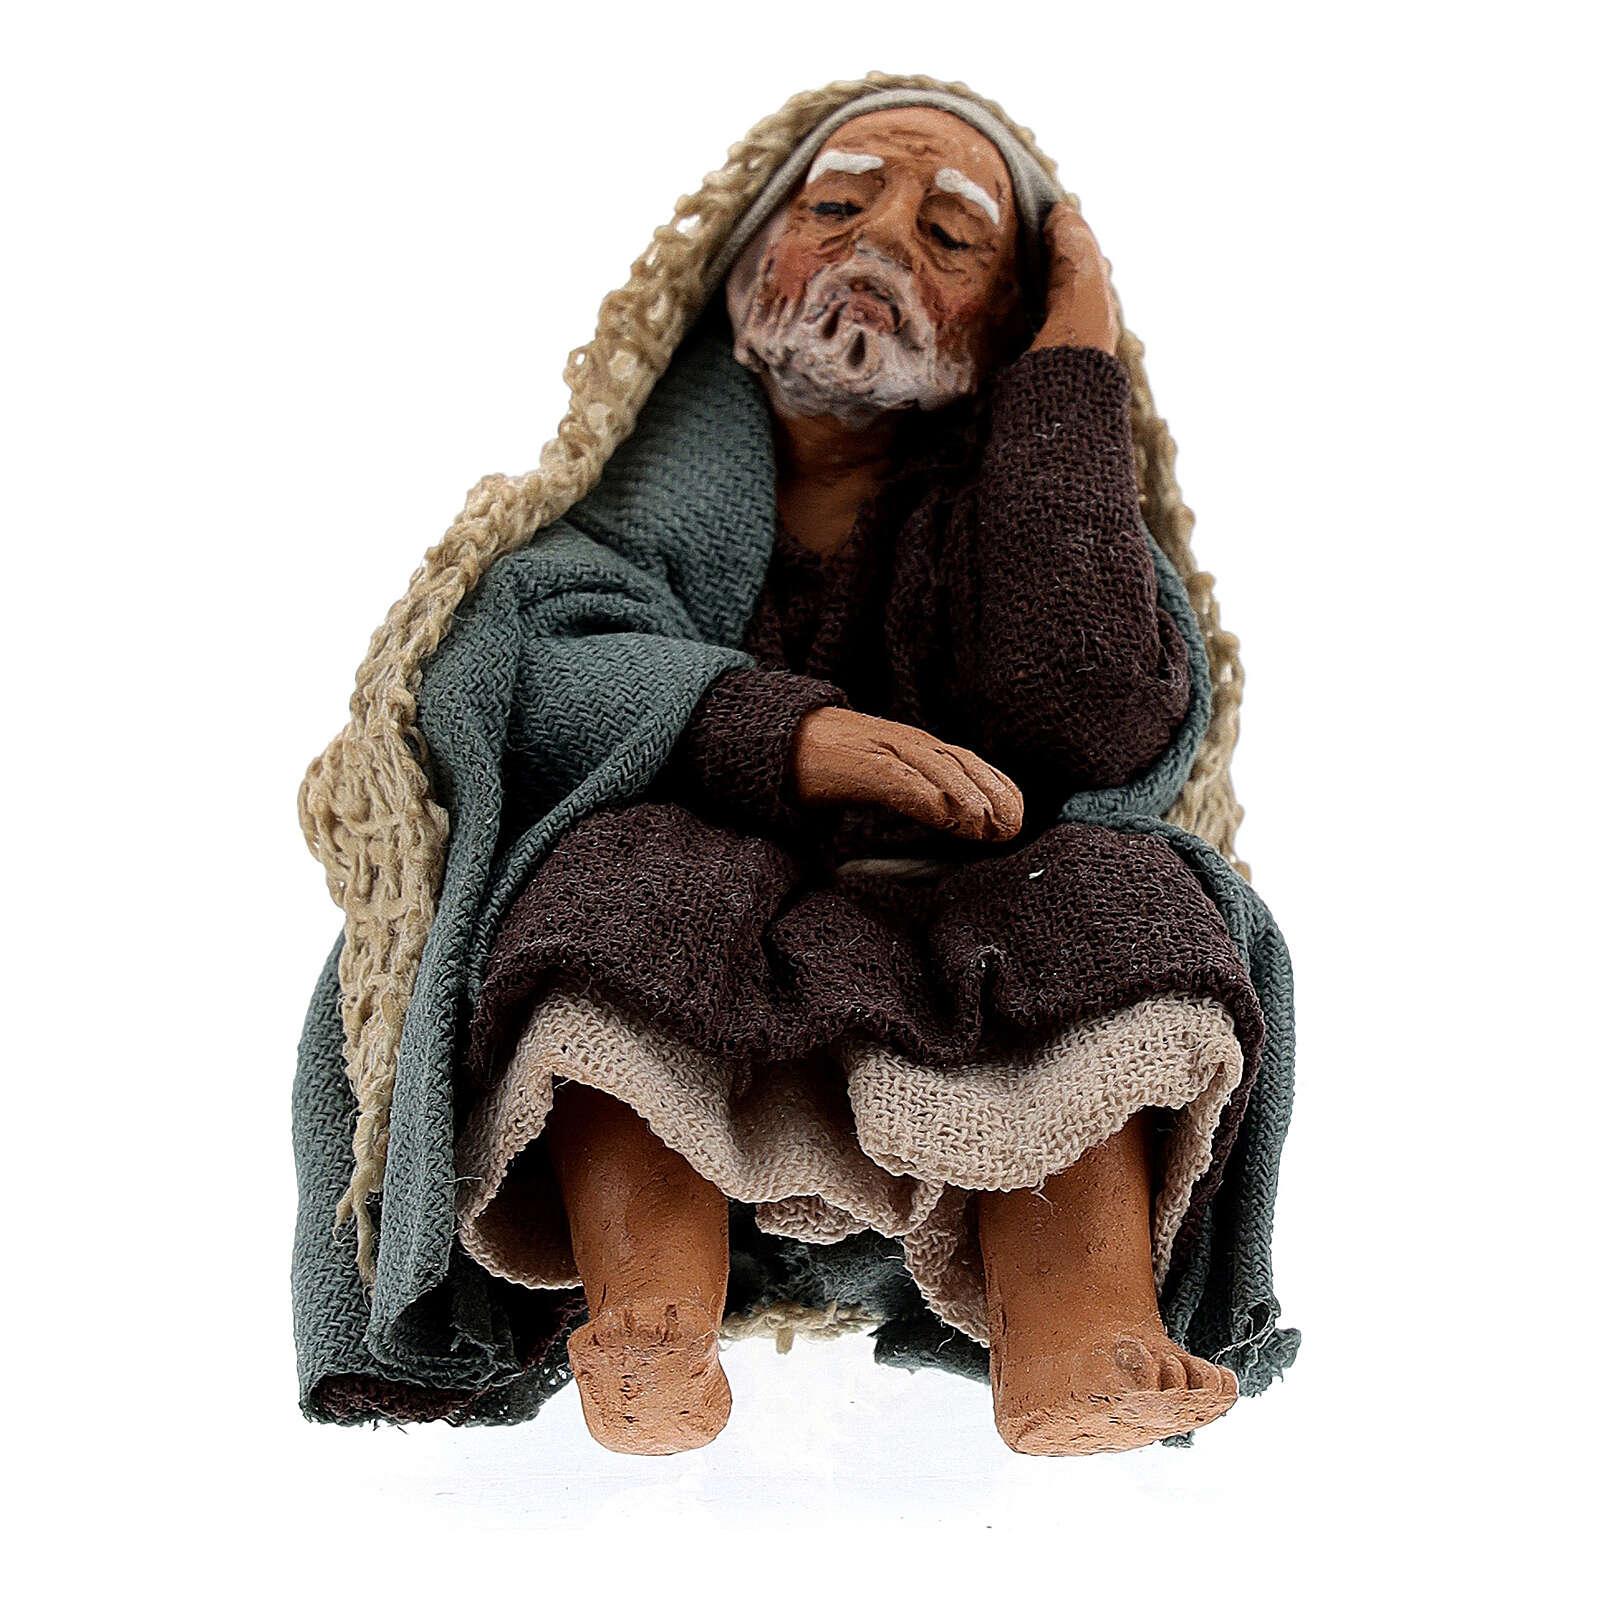 Resting man figure Neapolitan nativity scene 10 cm 4